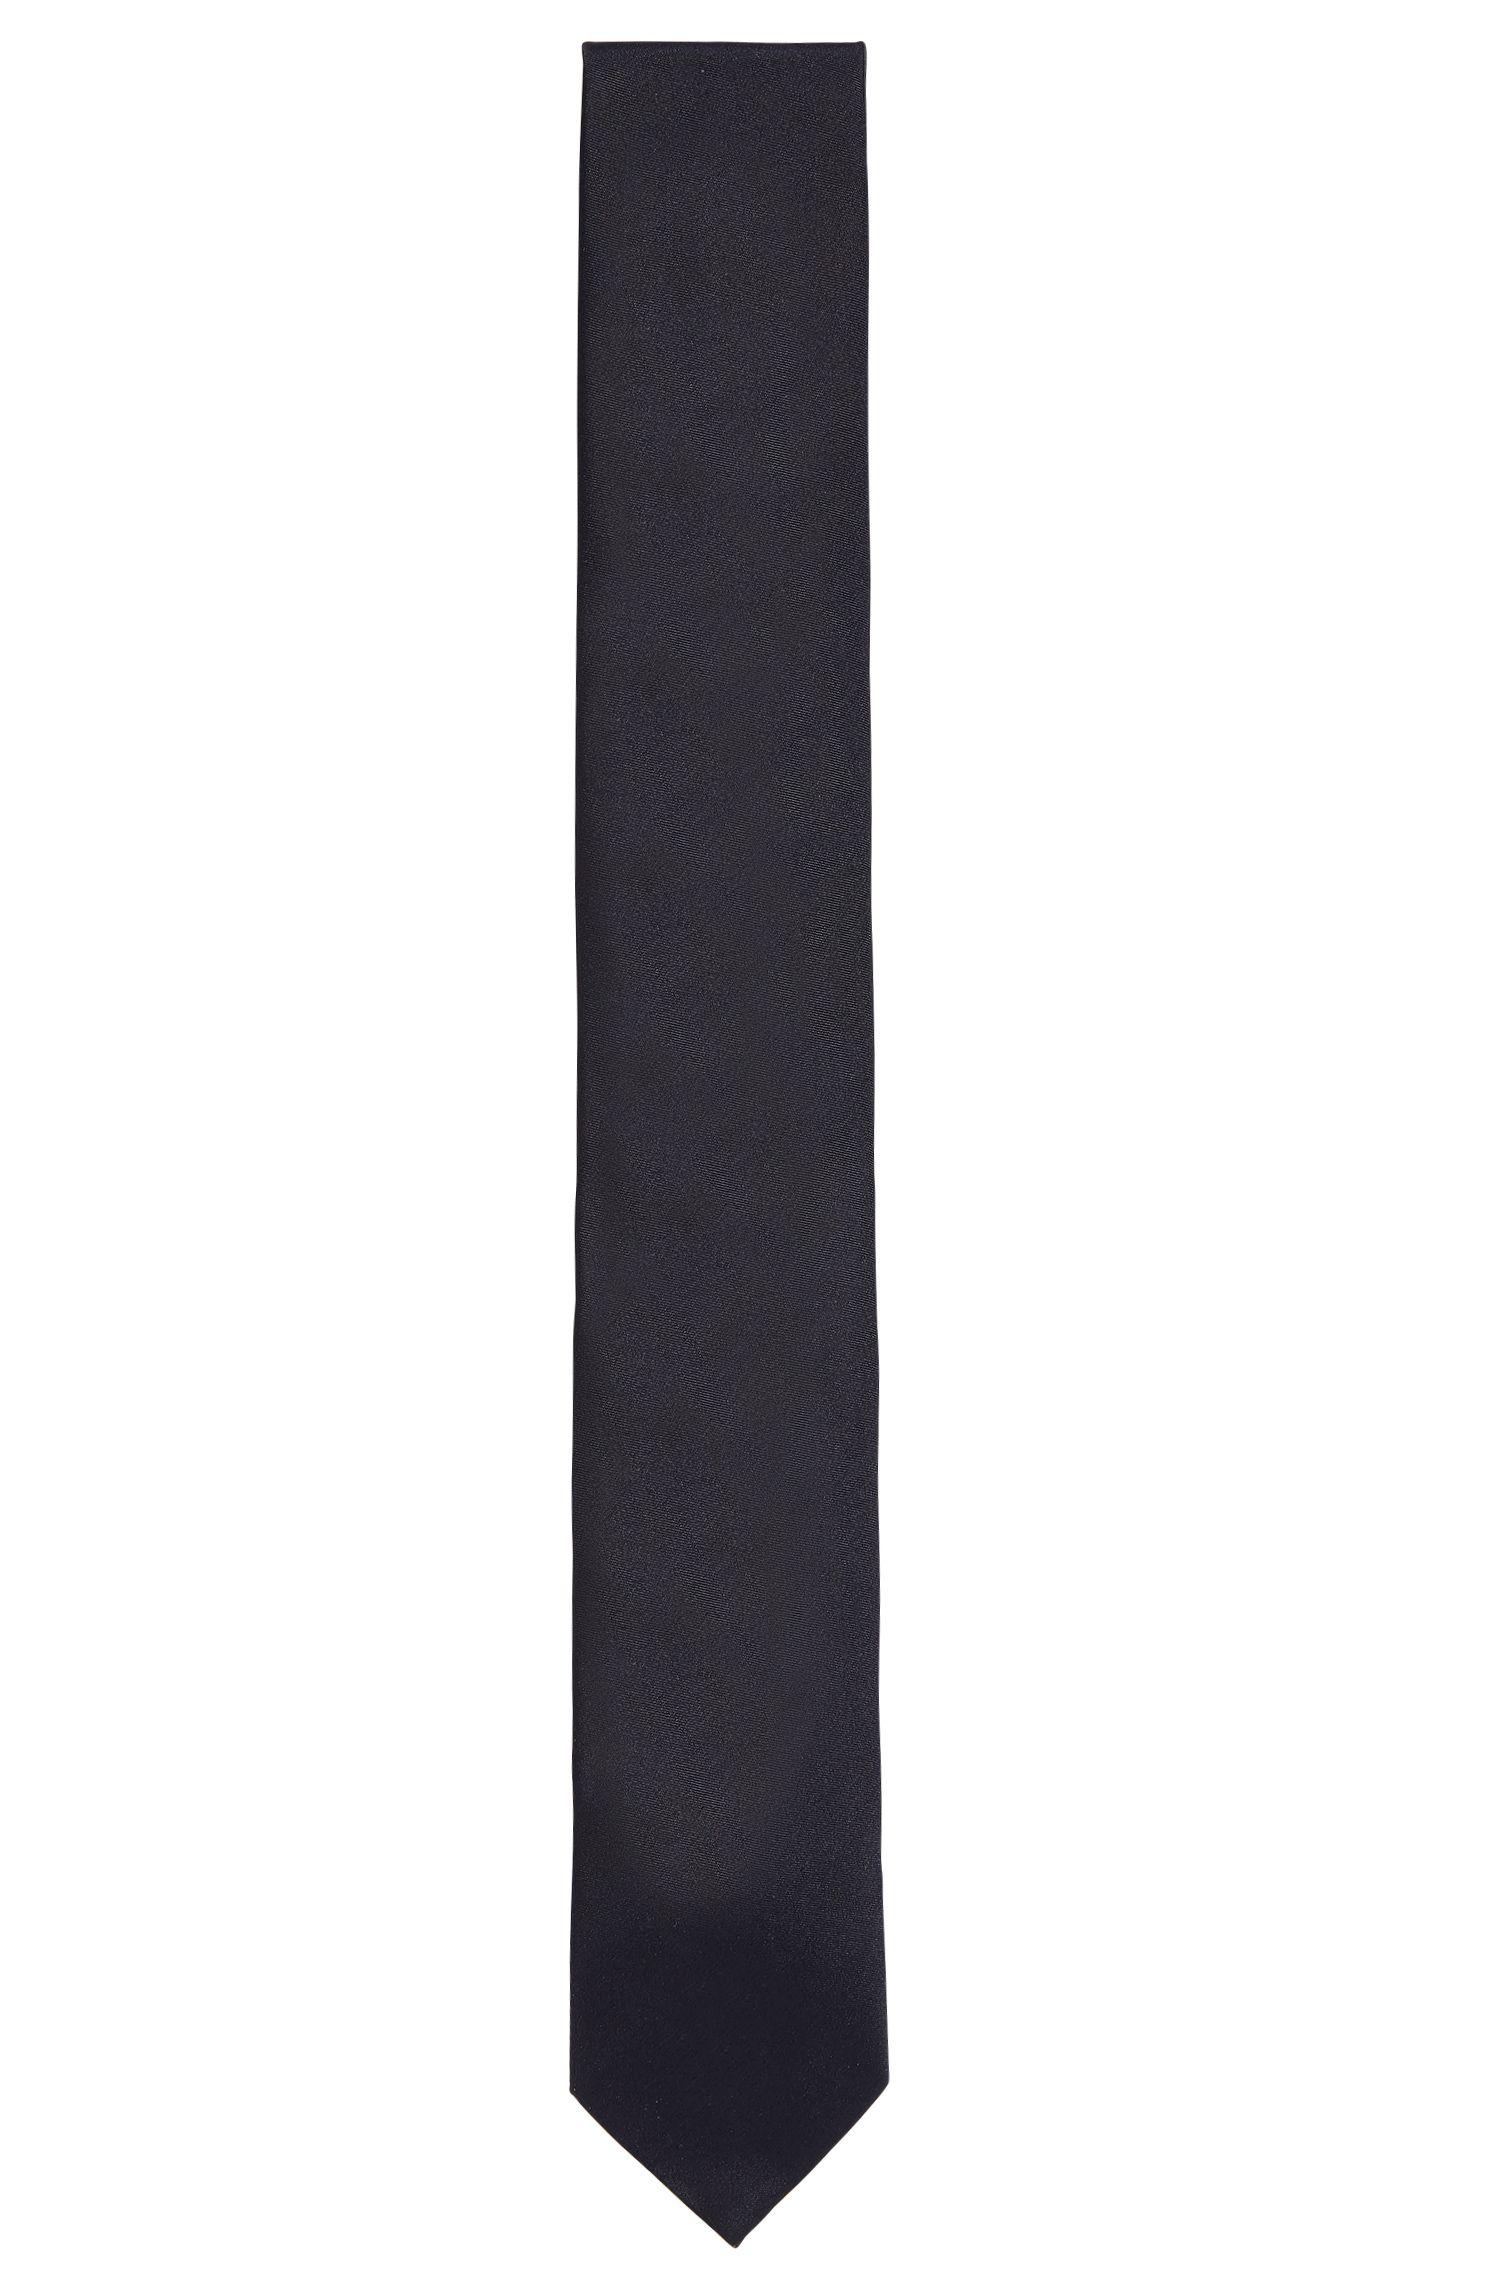 Jacquard-Krawatte aus reiner Seide